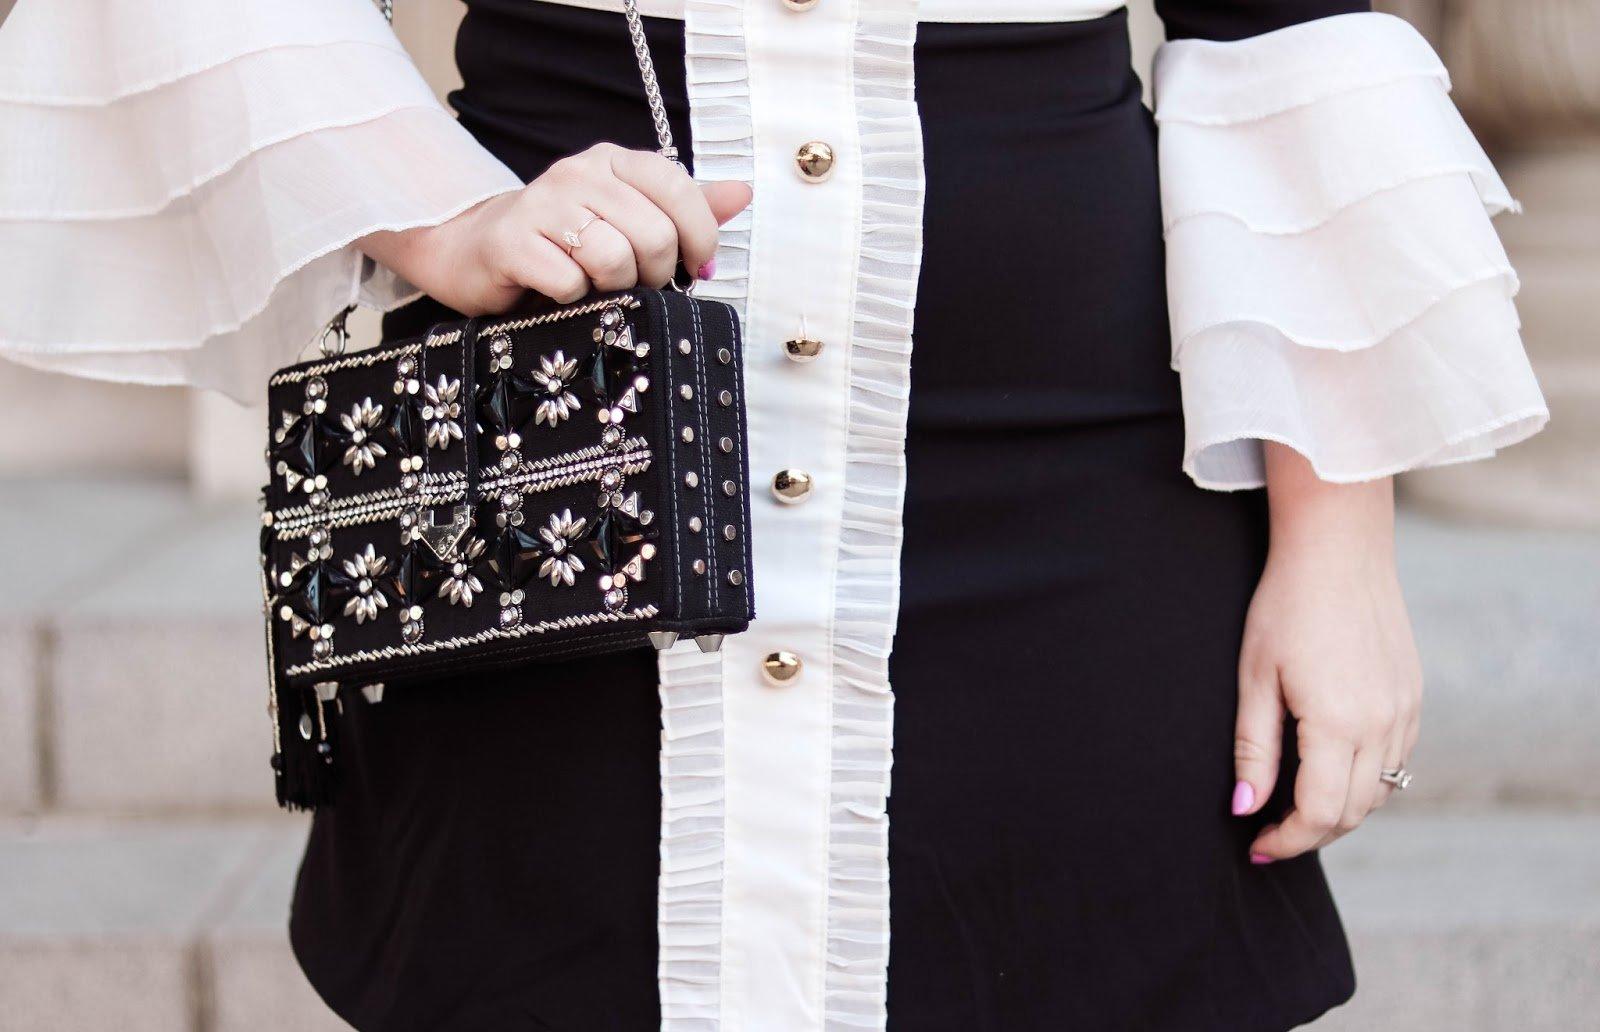 Fashion Blogger Elizabeth Hugen of Lizzie in Lace shares her Mary Frances designer handbag collection including this gorgeous black jeweled handbag